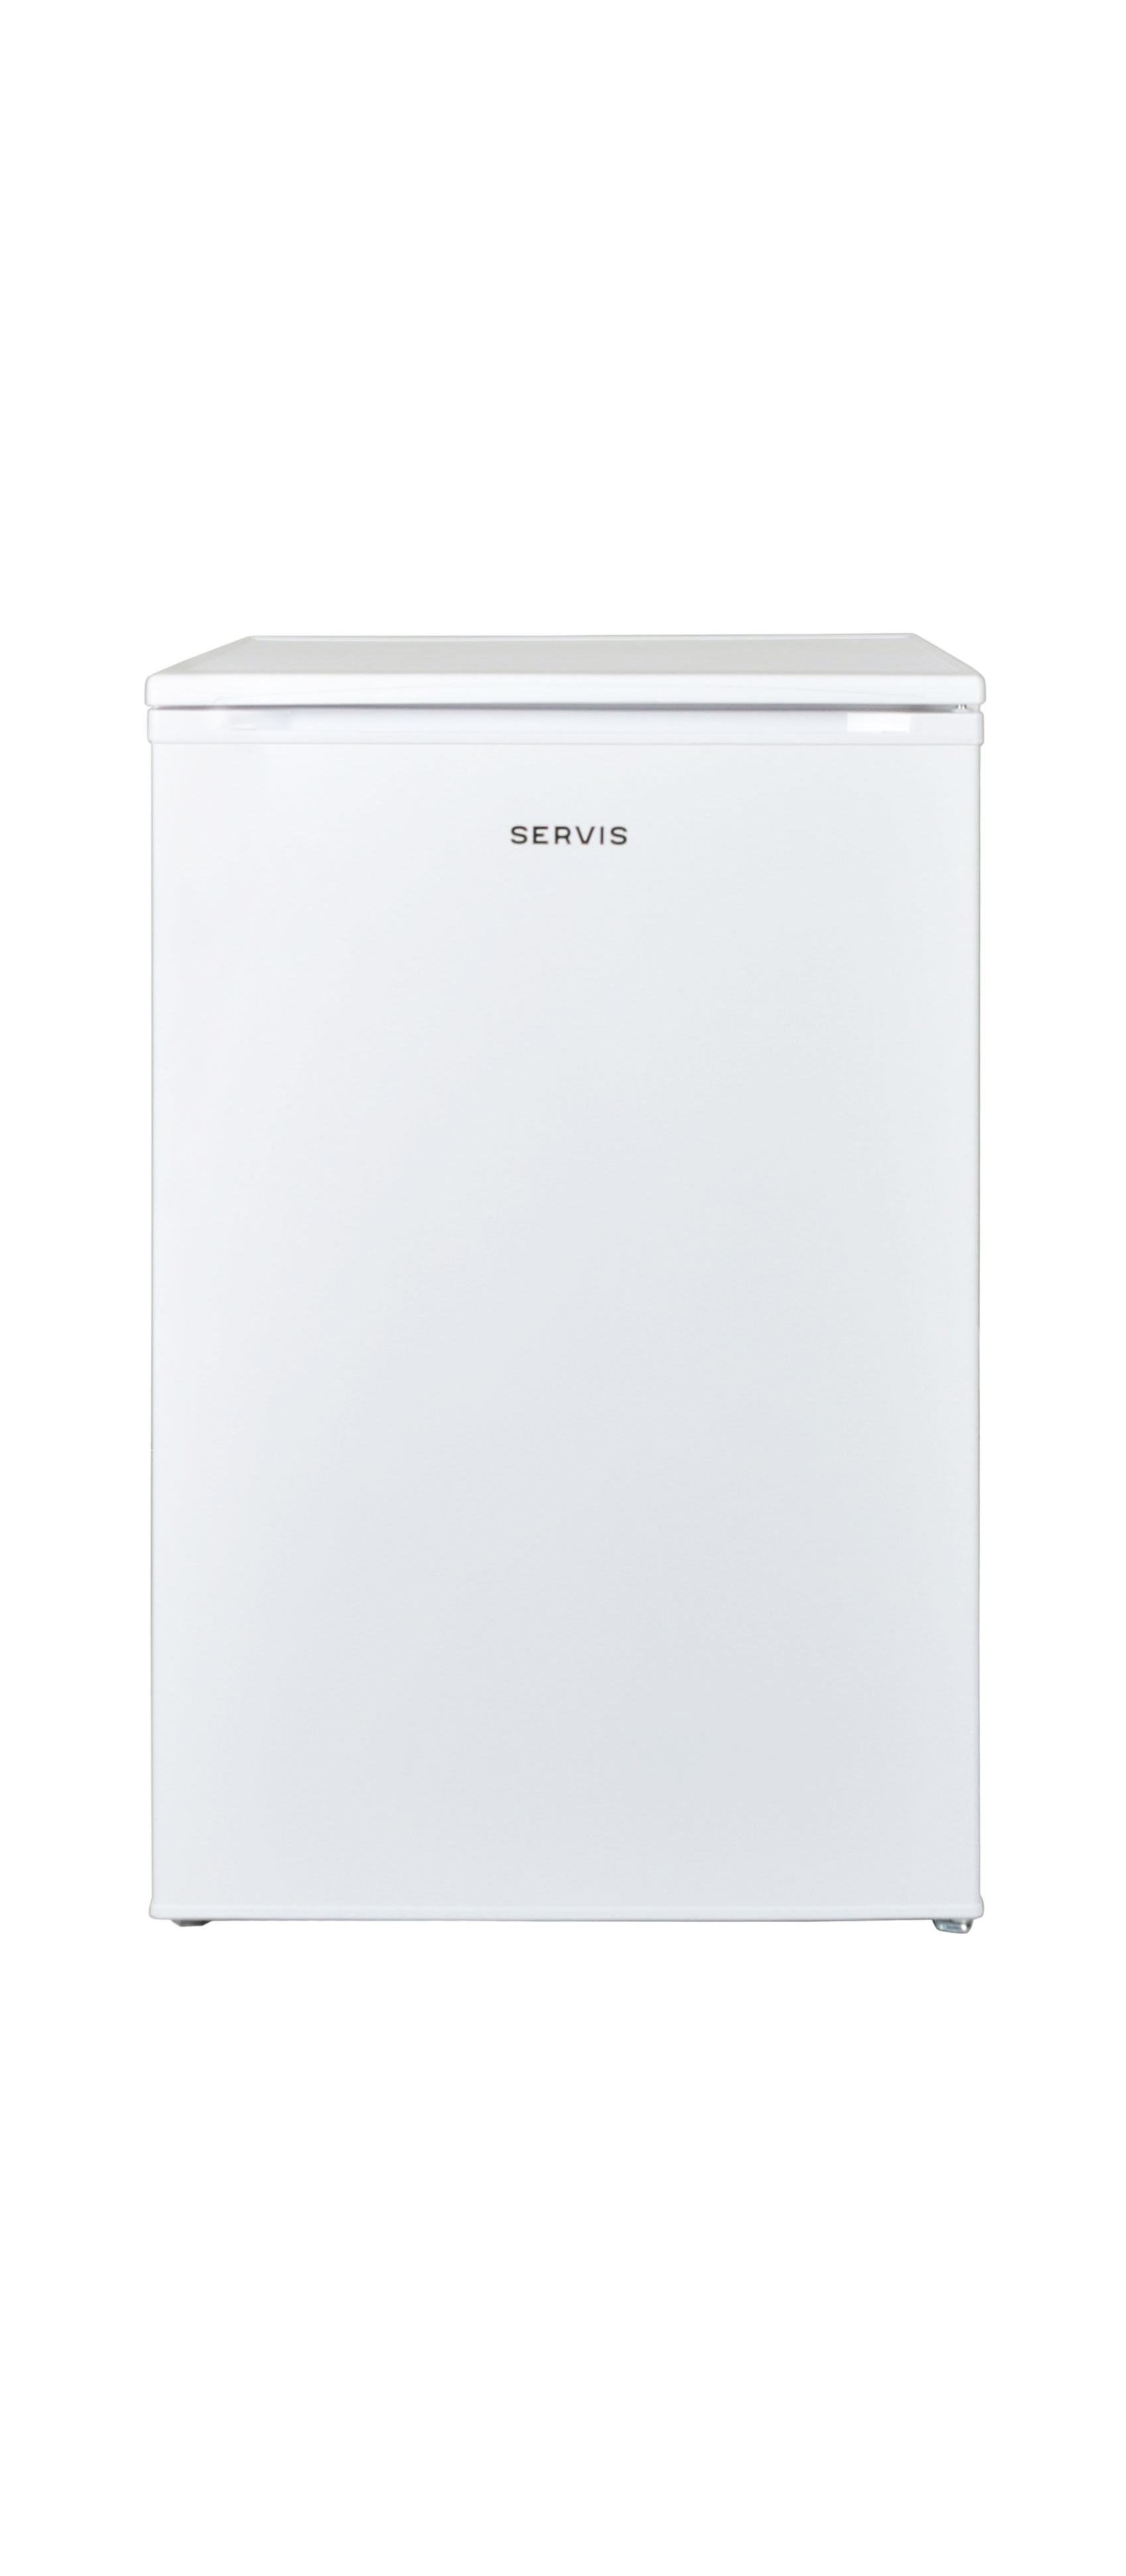 UF48W - Undercounter Freezer